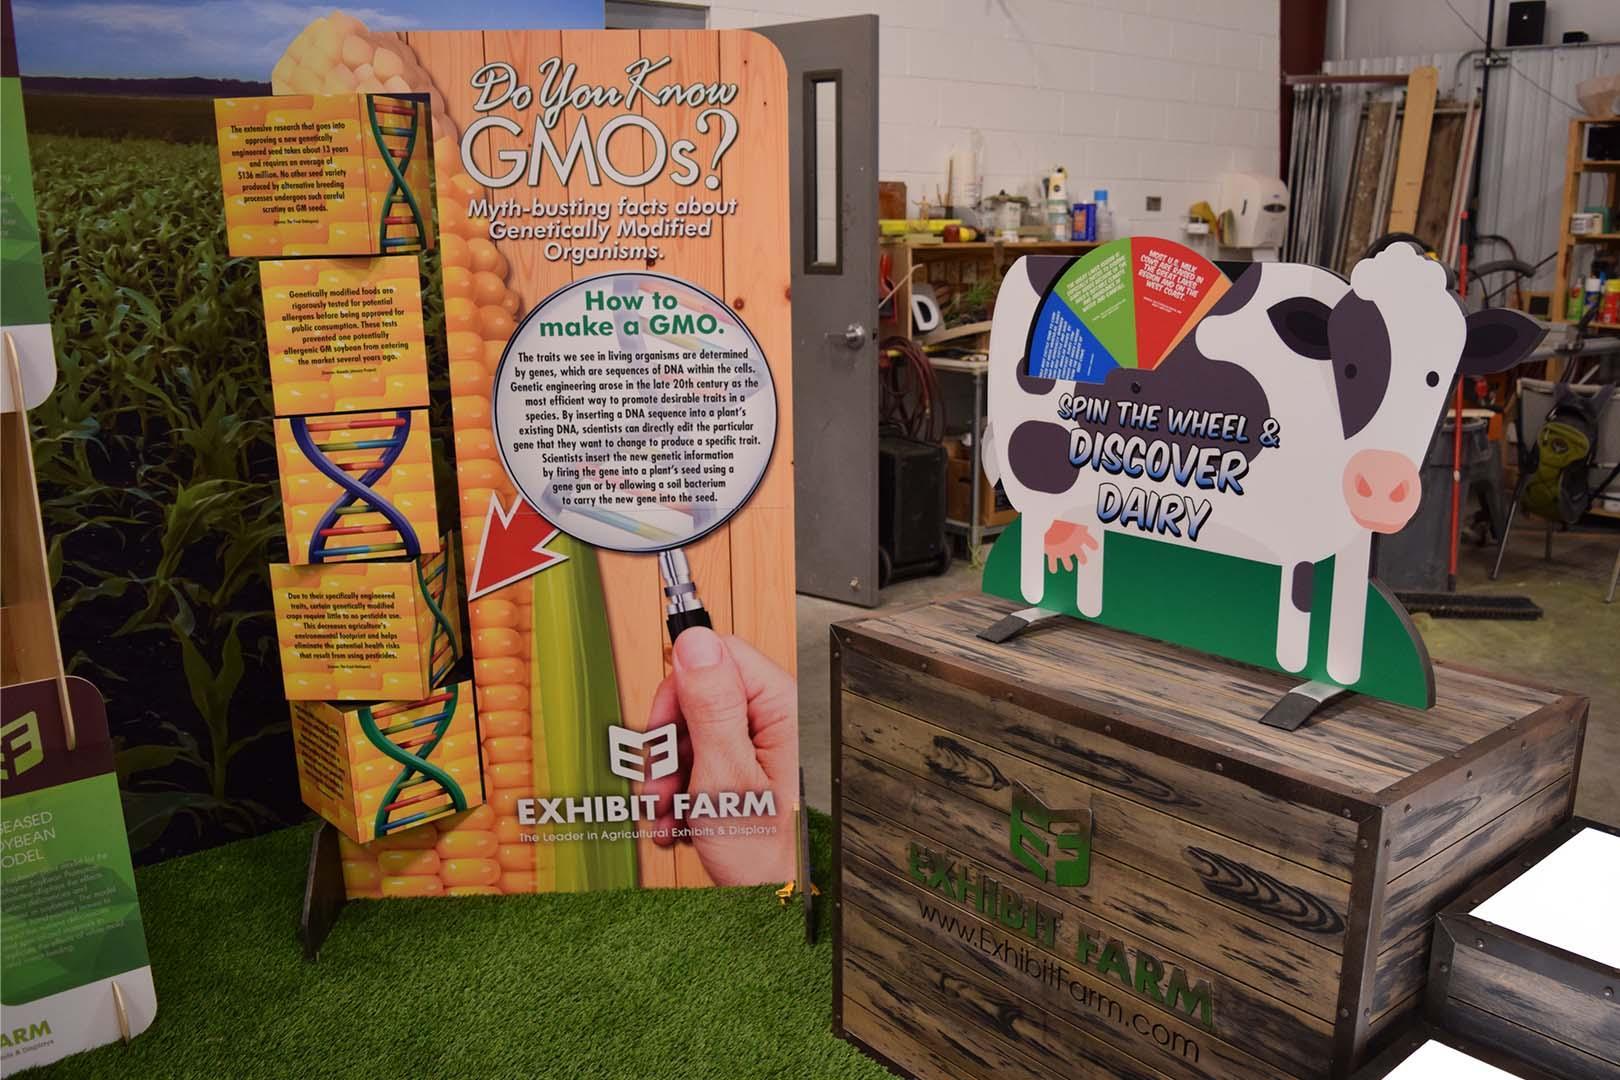 Exhibit Farm Booth Displays